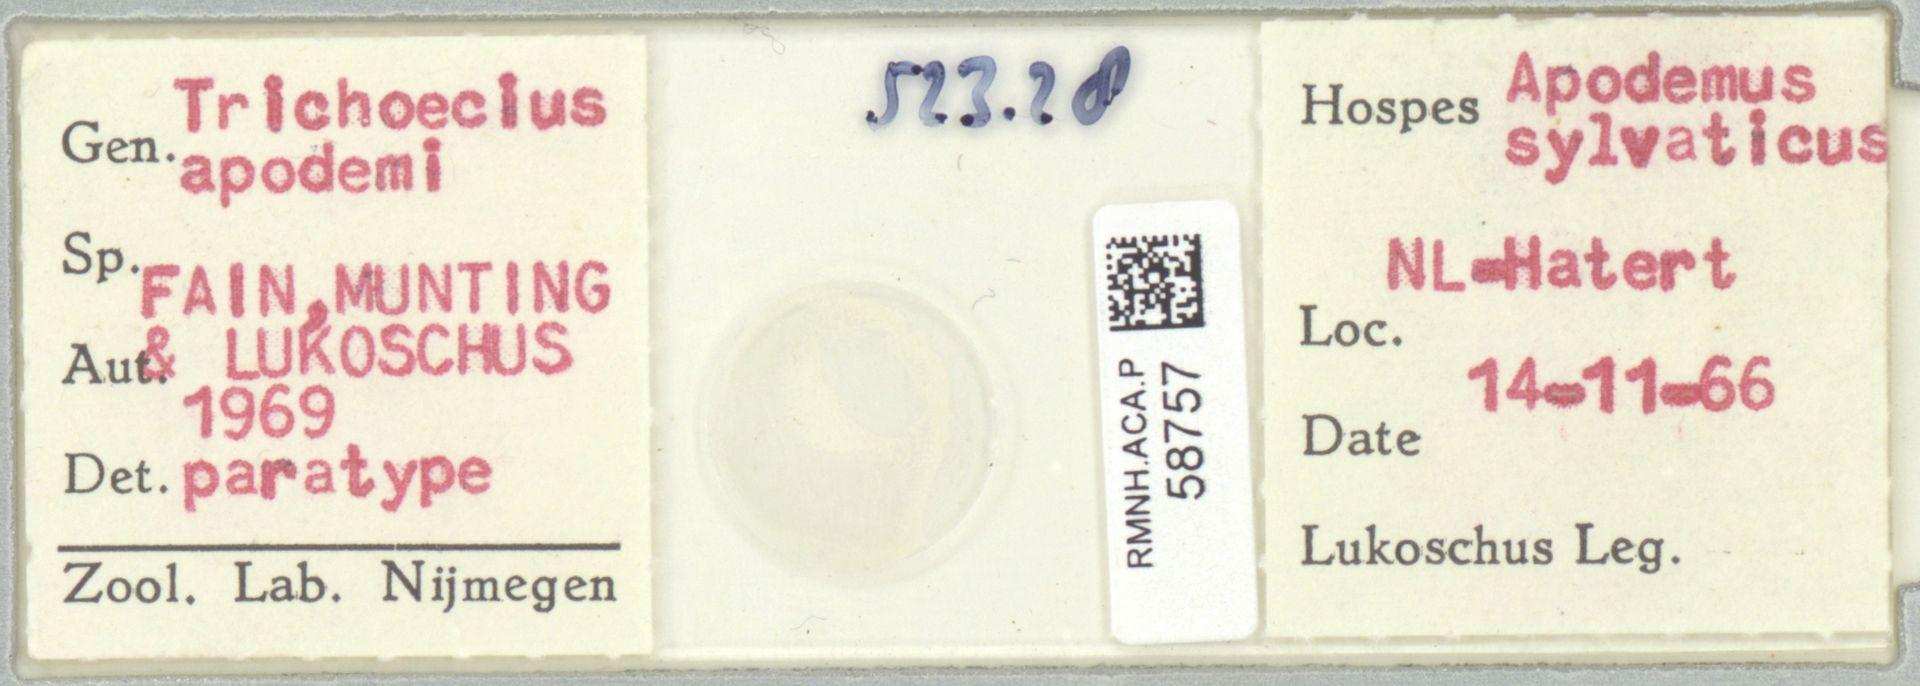 RMNH.ACA.P.58757   Trichoecius apodemi Fain, Munting & Lukoschus 1969